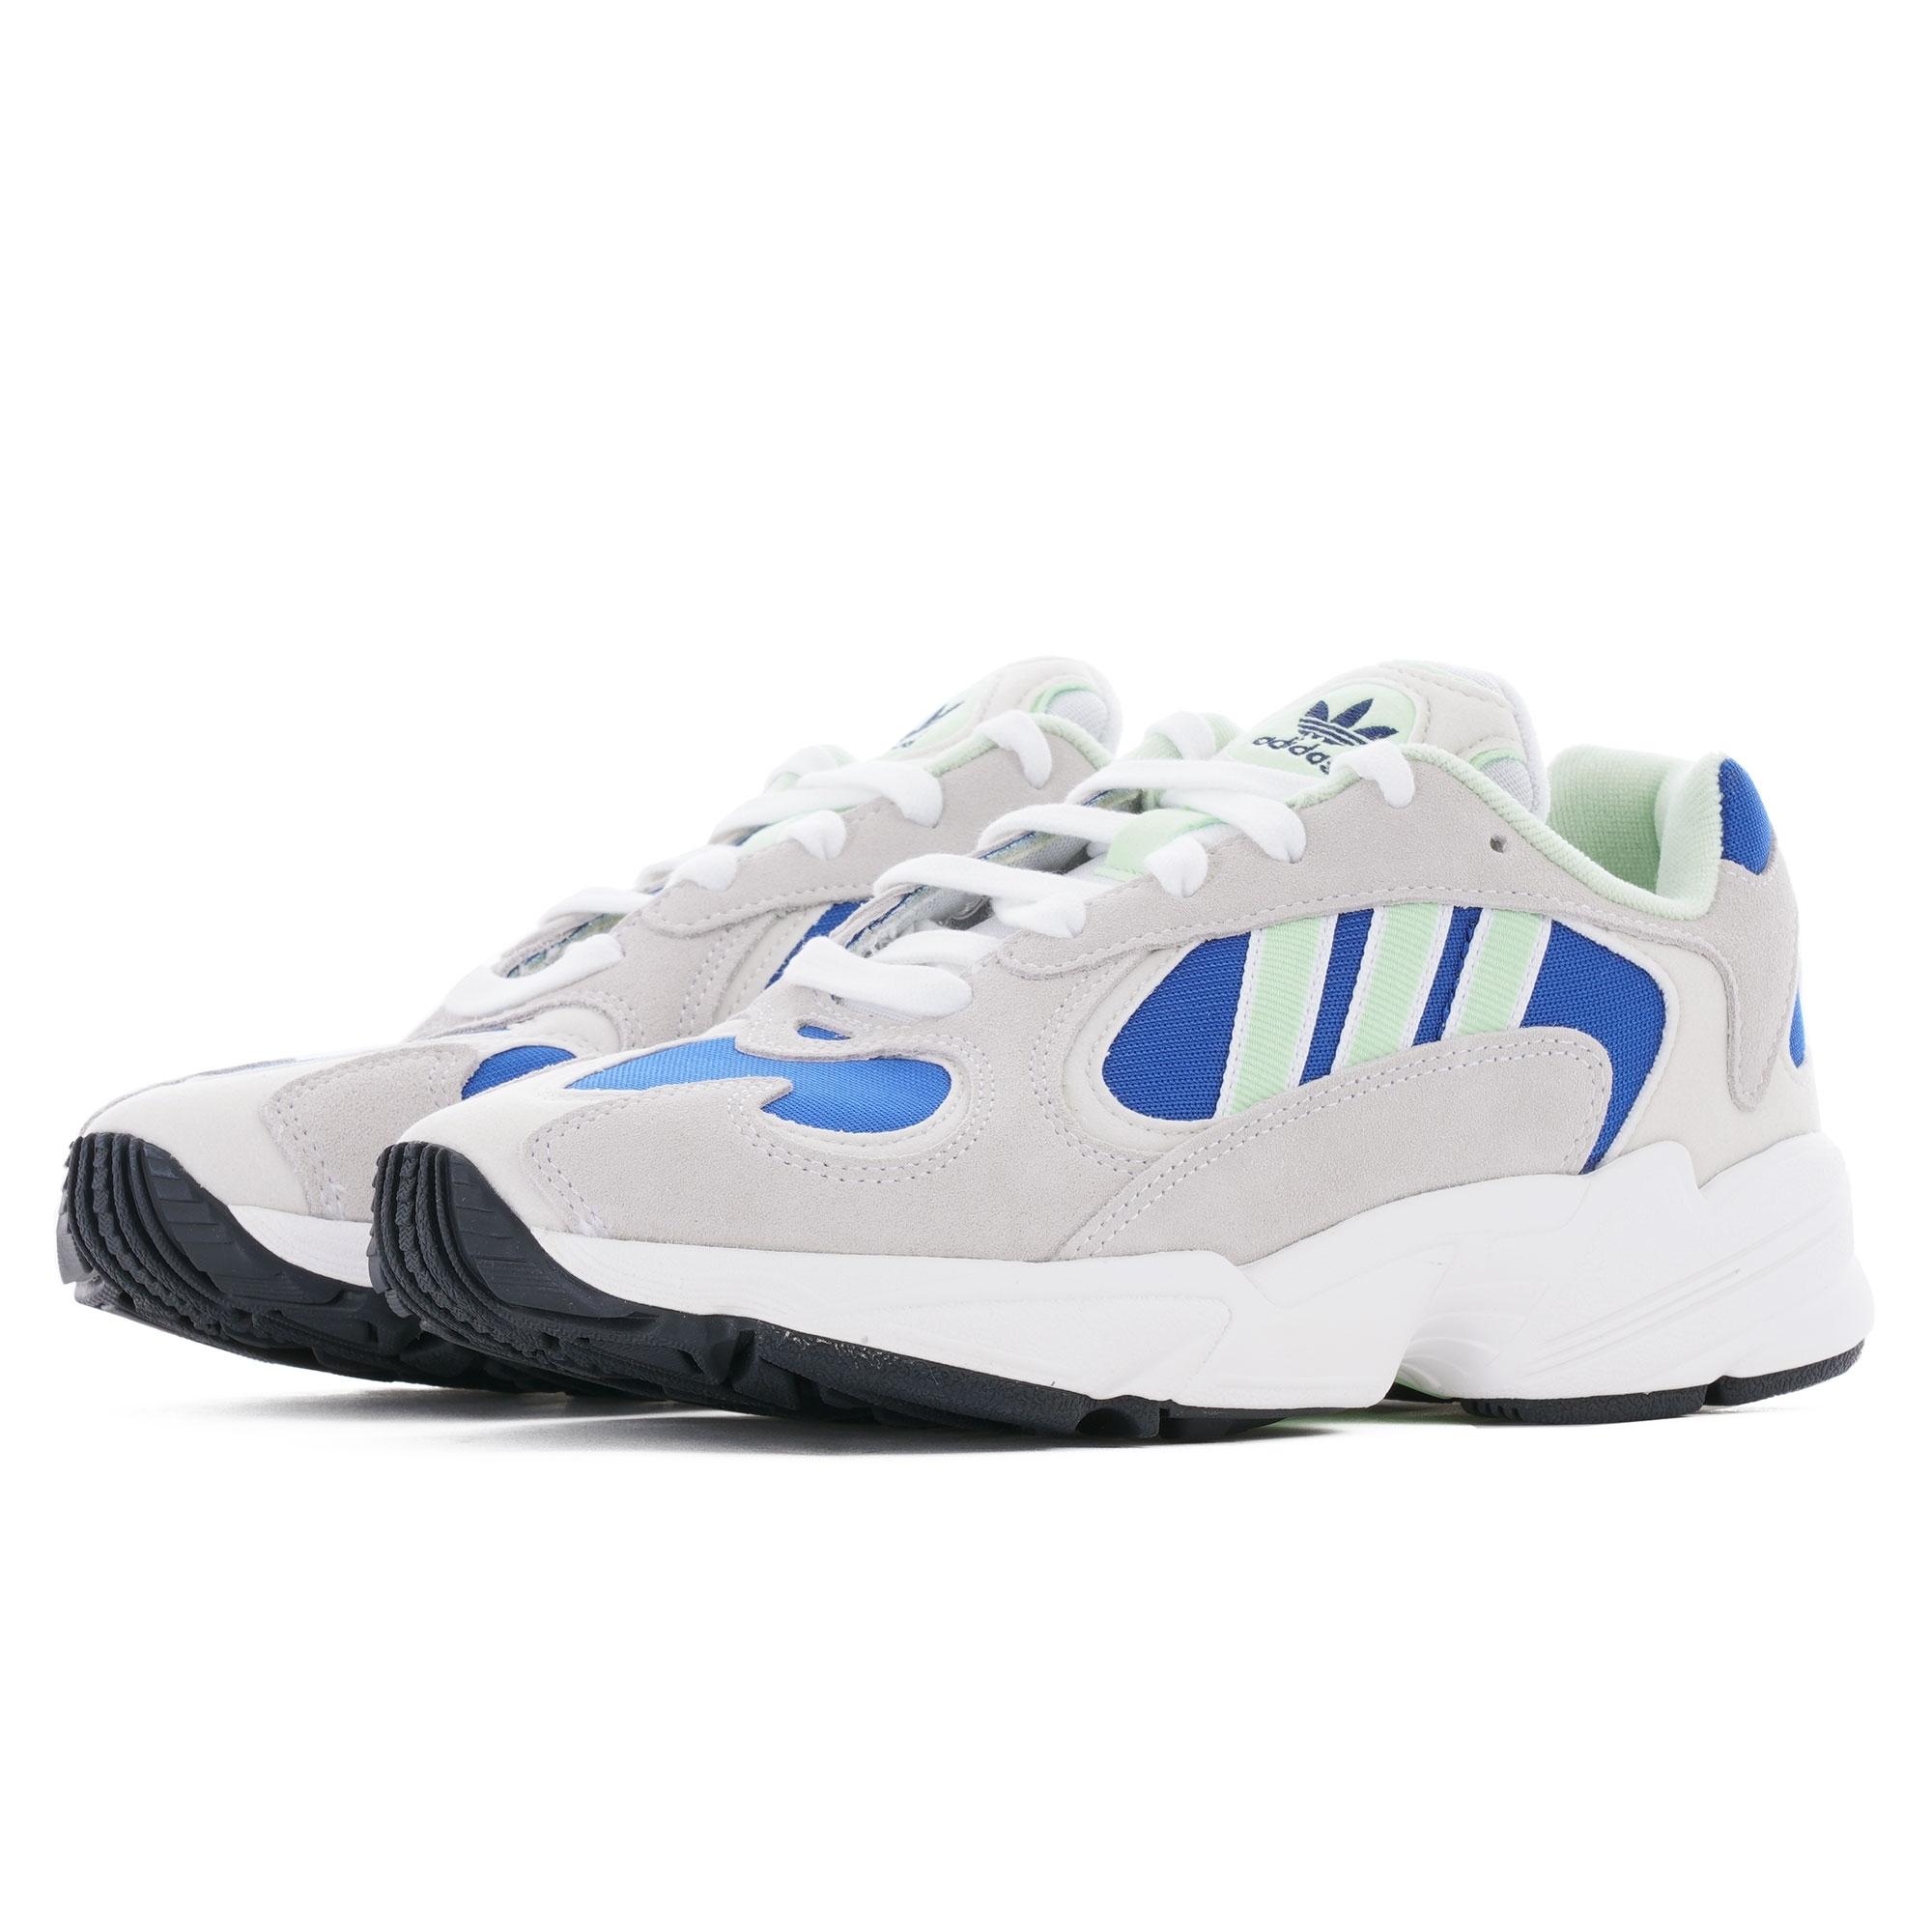 Yung 1 White & Blue